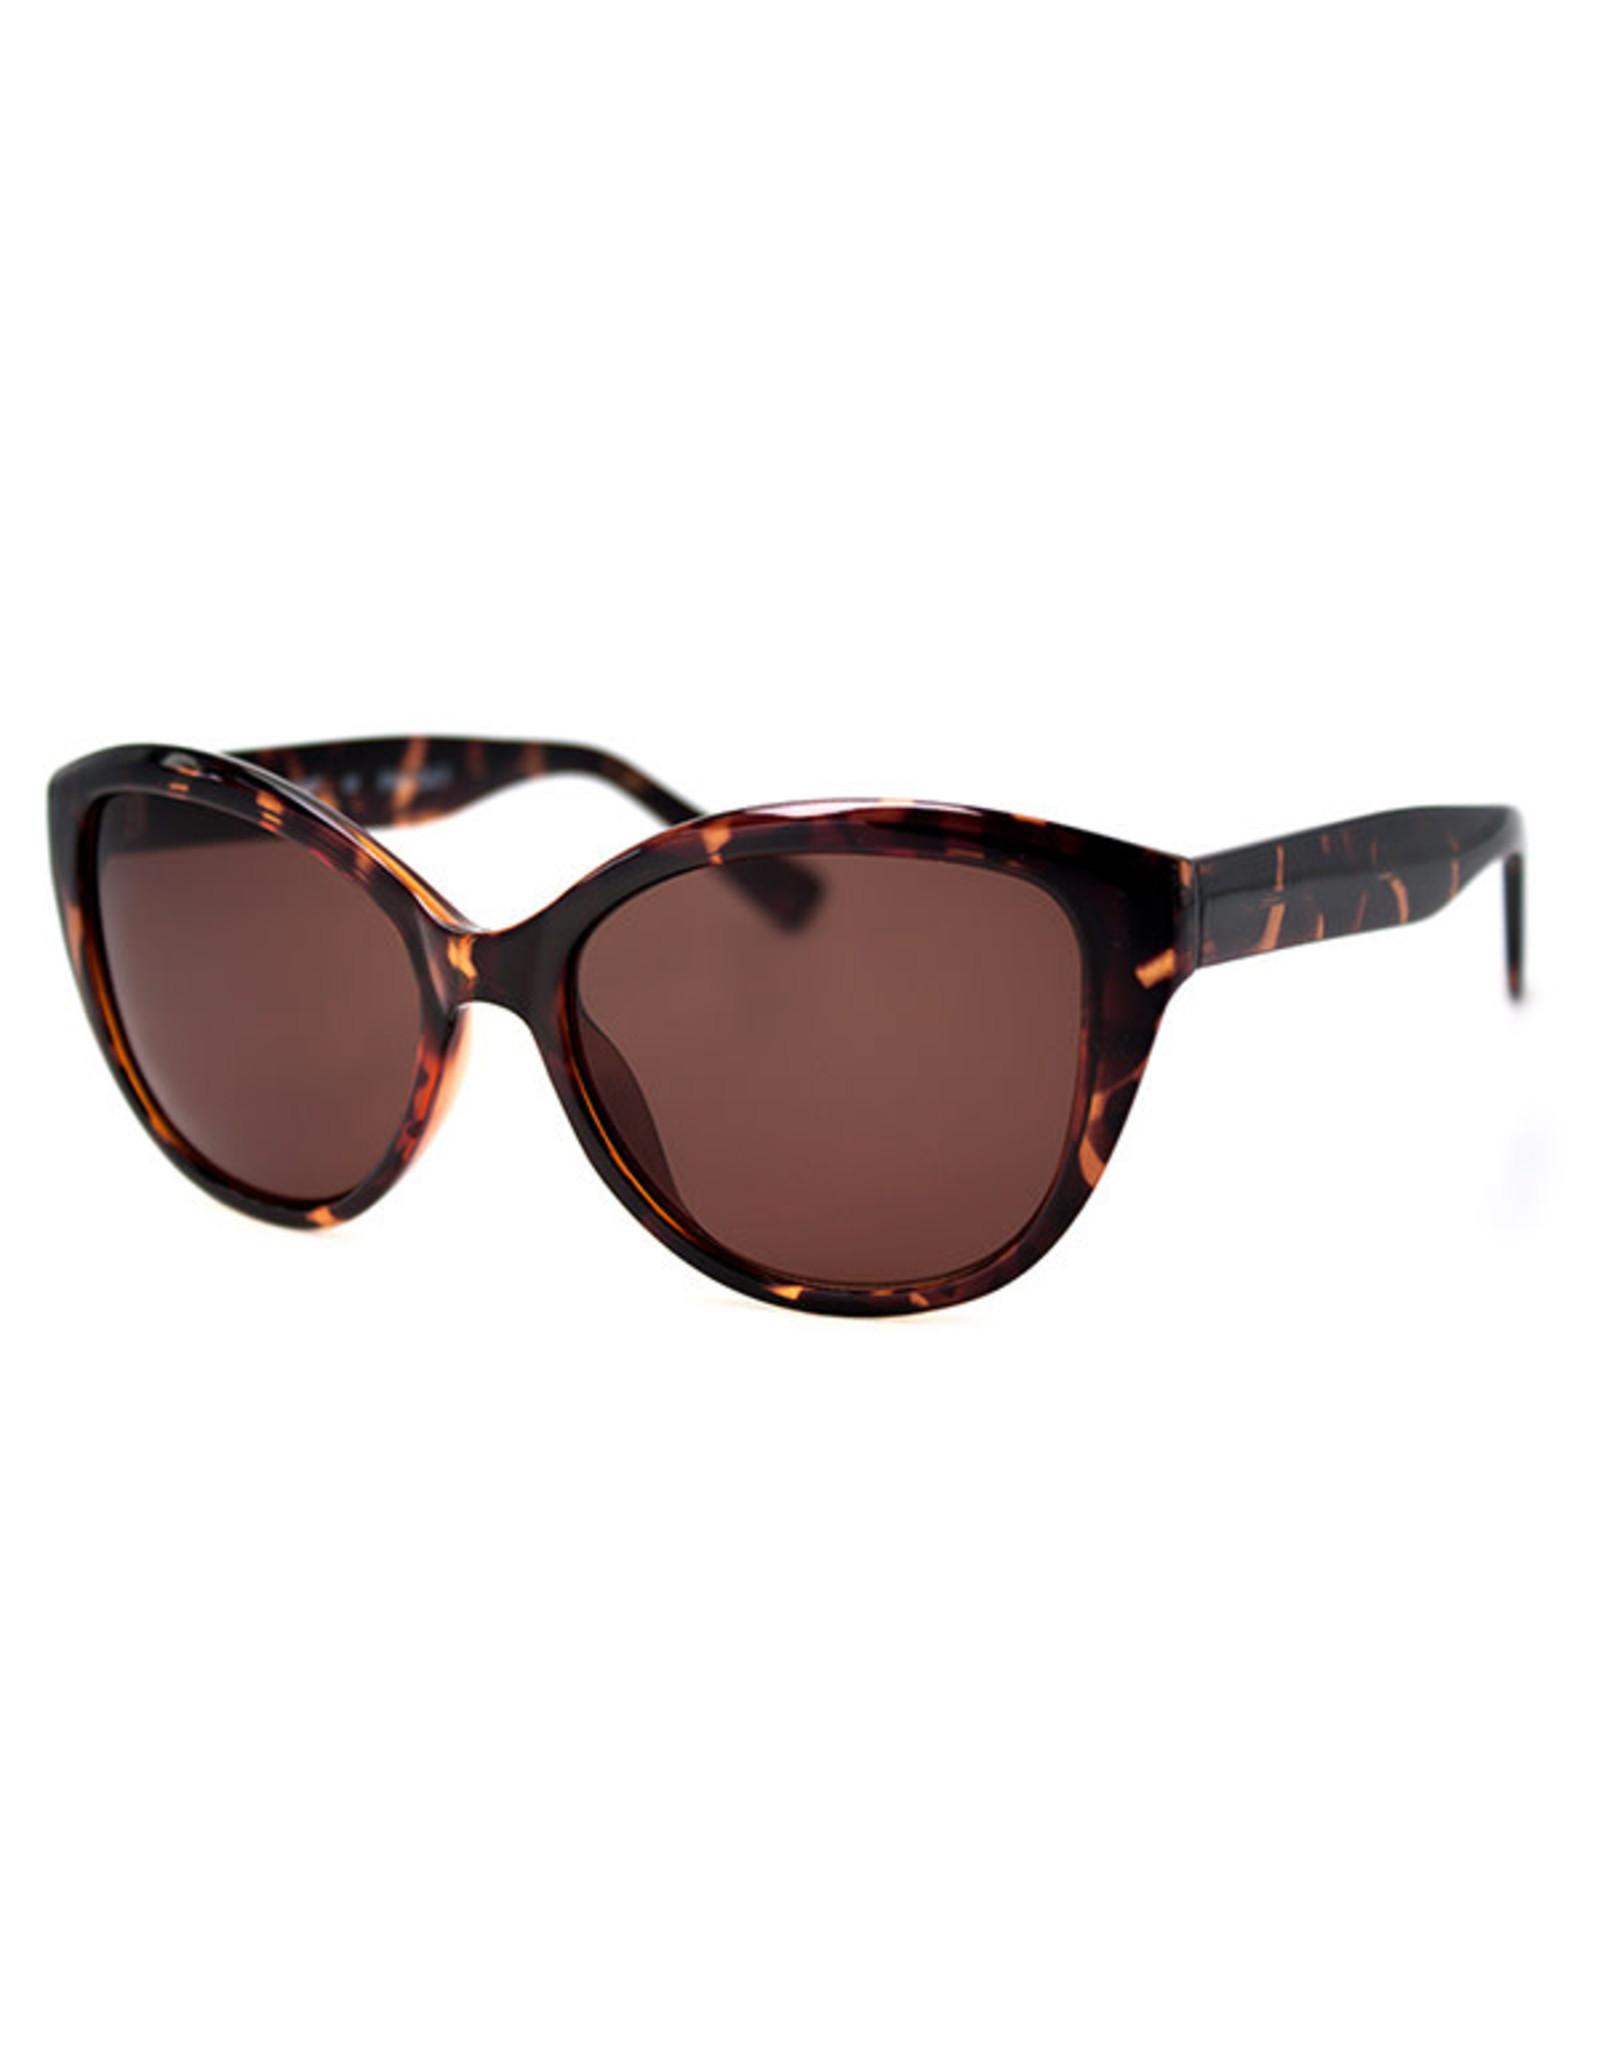 AJM - Cat-Eye Frame Sunglasses